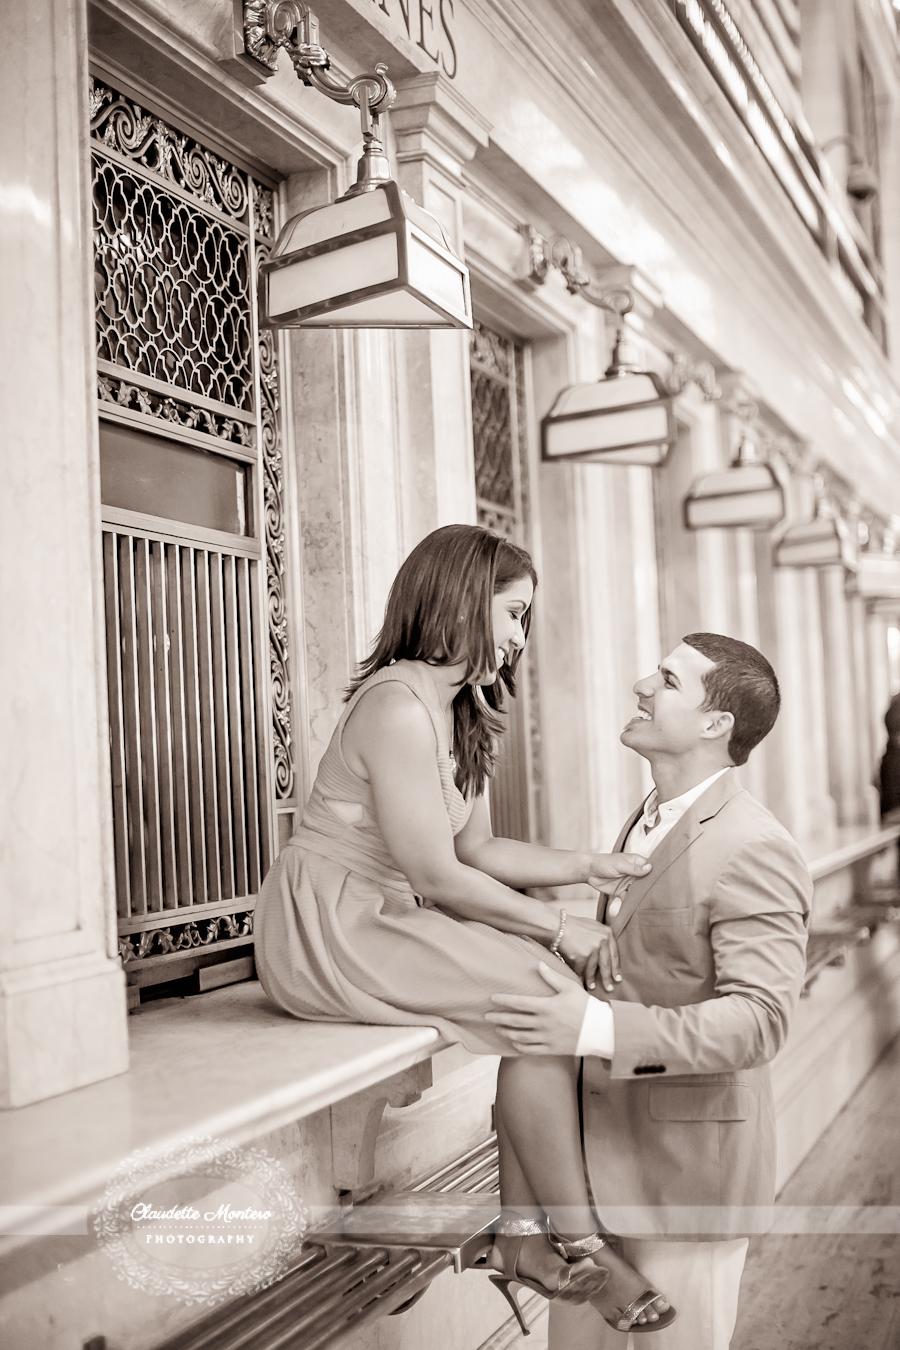 claudette-montero-photography-amaris-emmanuel-new-york-engagement-session-yaska-crespo-wedding-planner-web-logo-9822